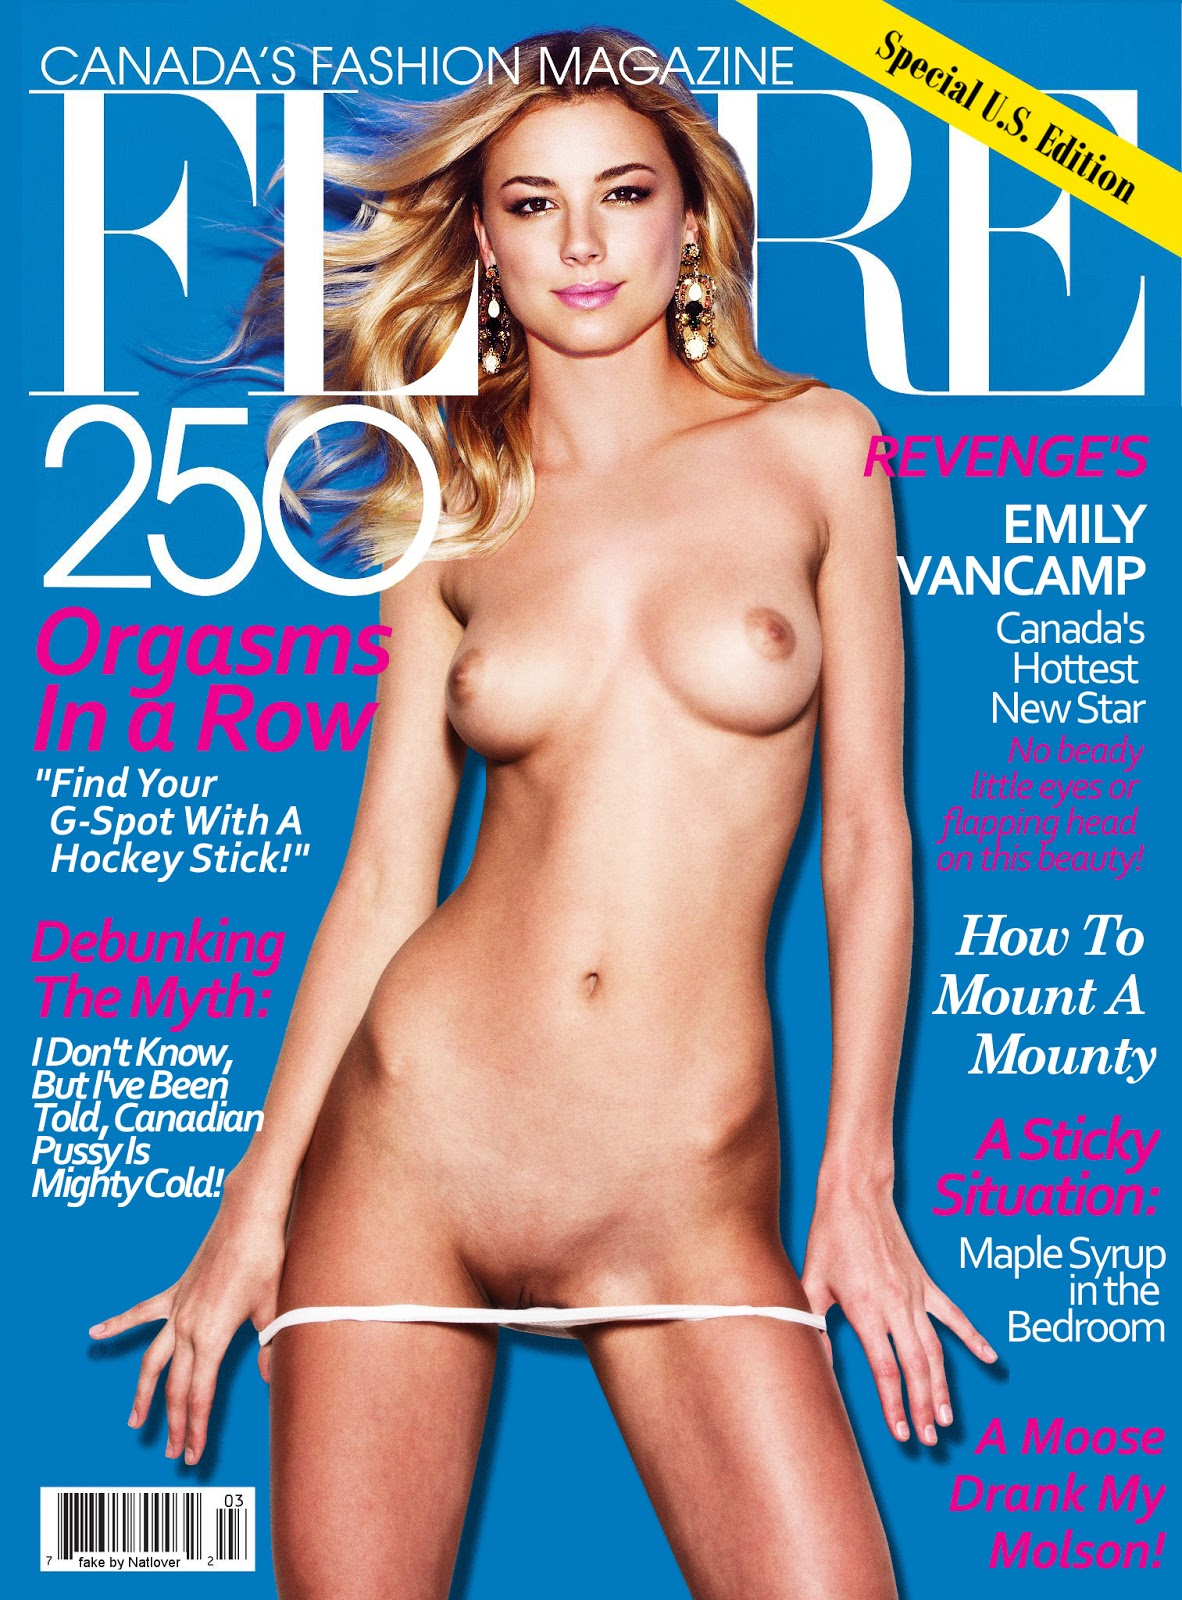 naked women getting enima